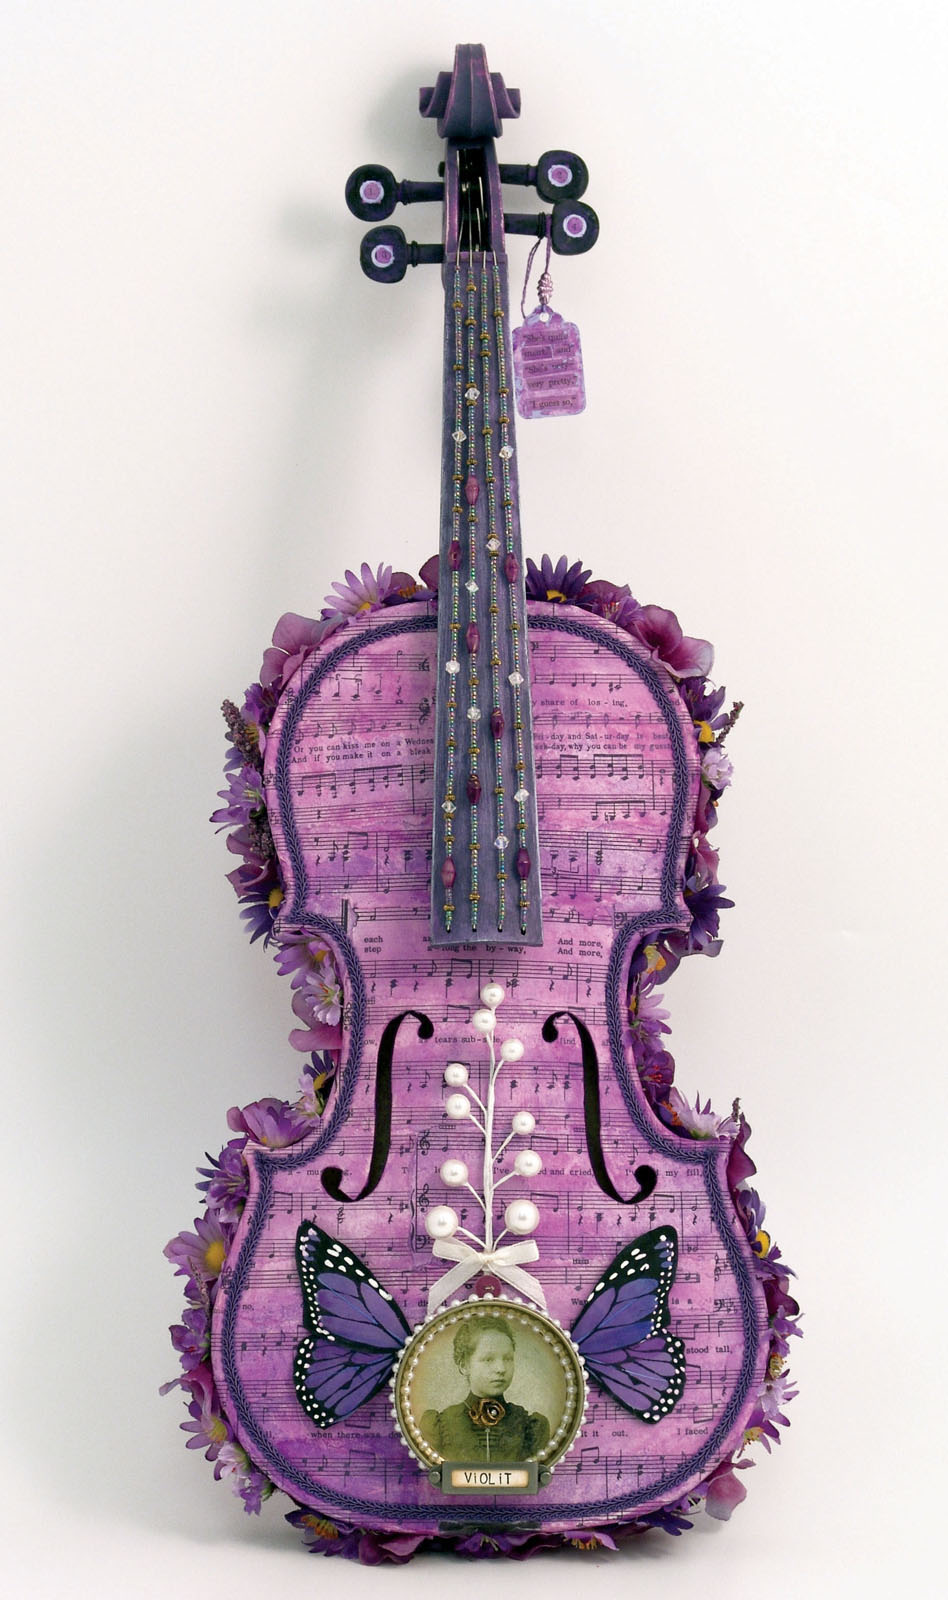 violit my completed nj...